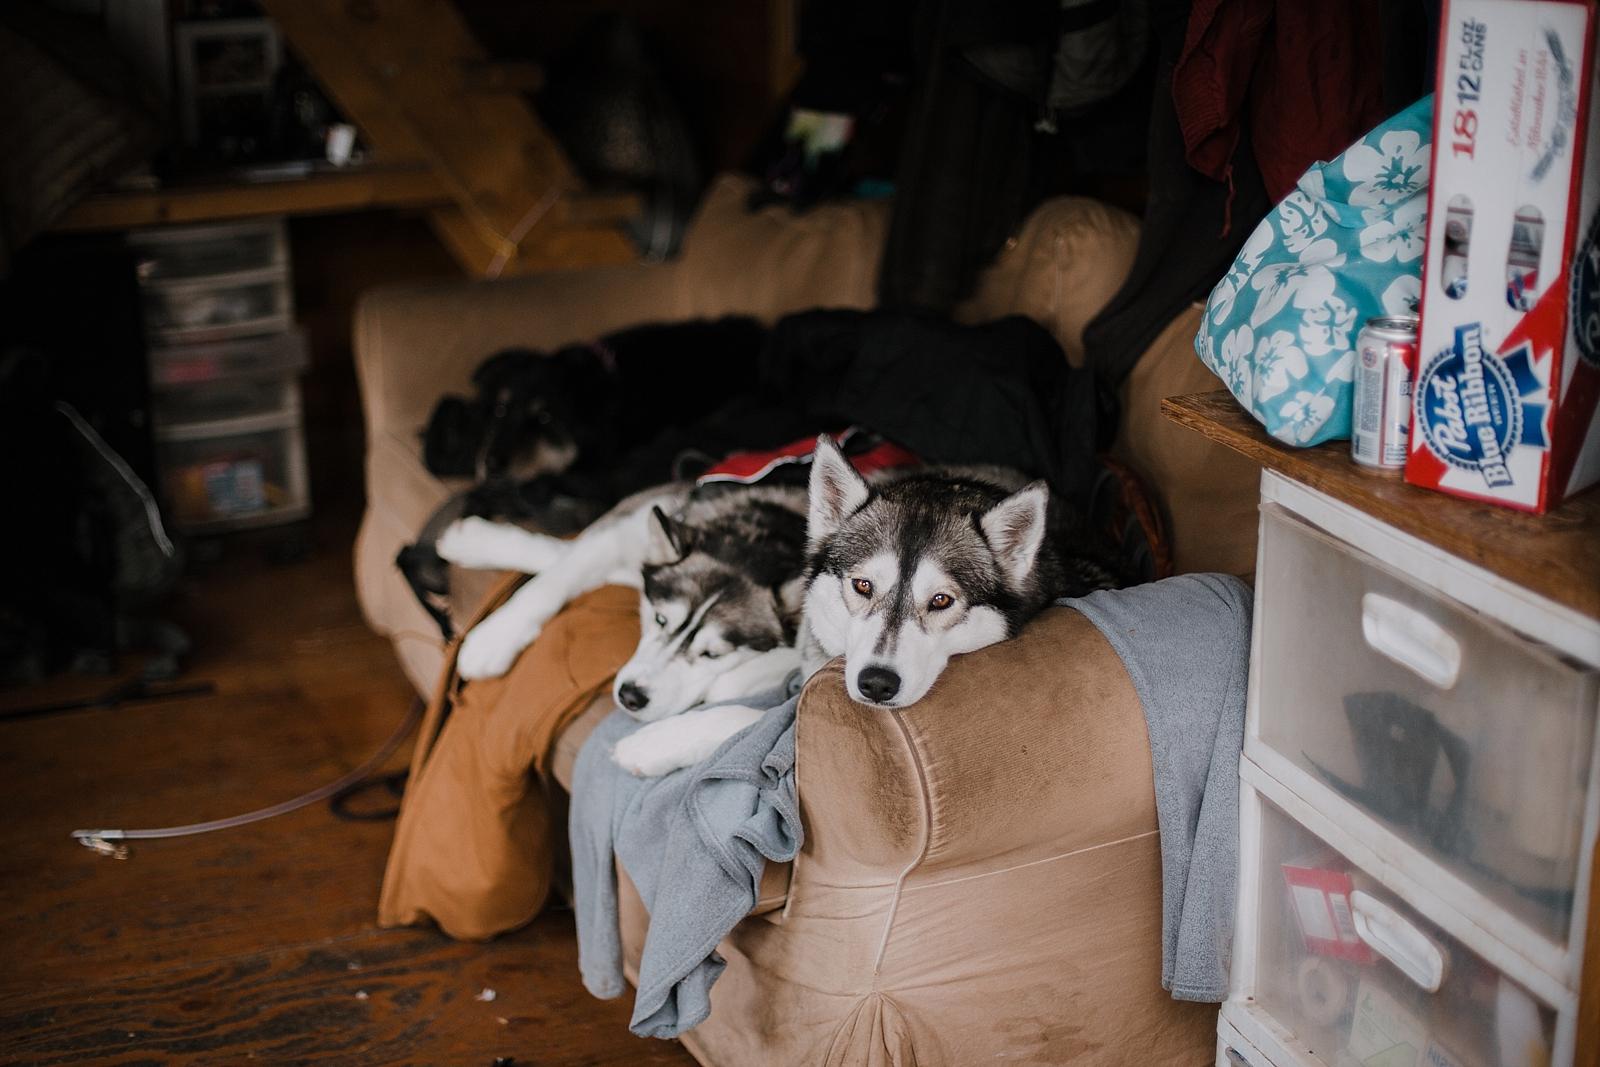 huskies sleeping, breckenridge colorado dogsledding, breckenridge colorado elopement photographer, breckenridge colorado wedding photographer, colorado dogsledding